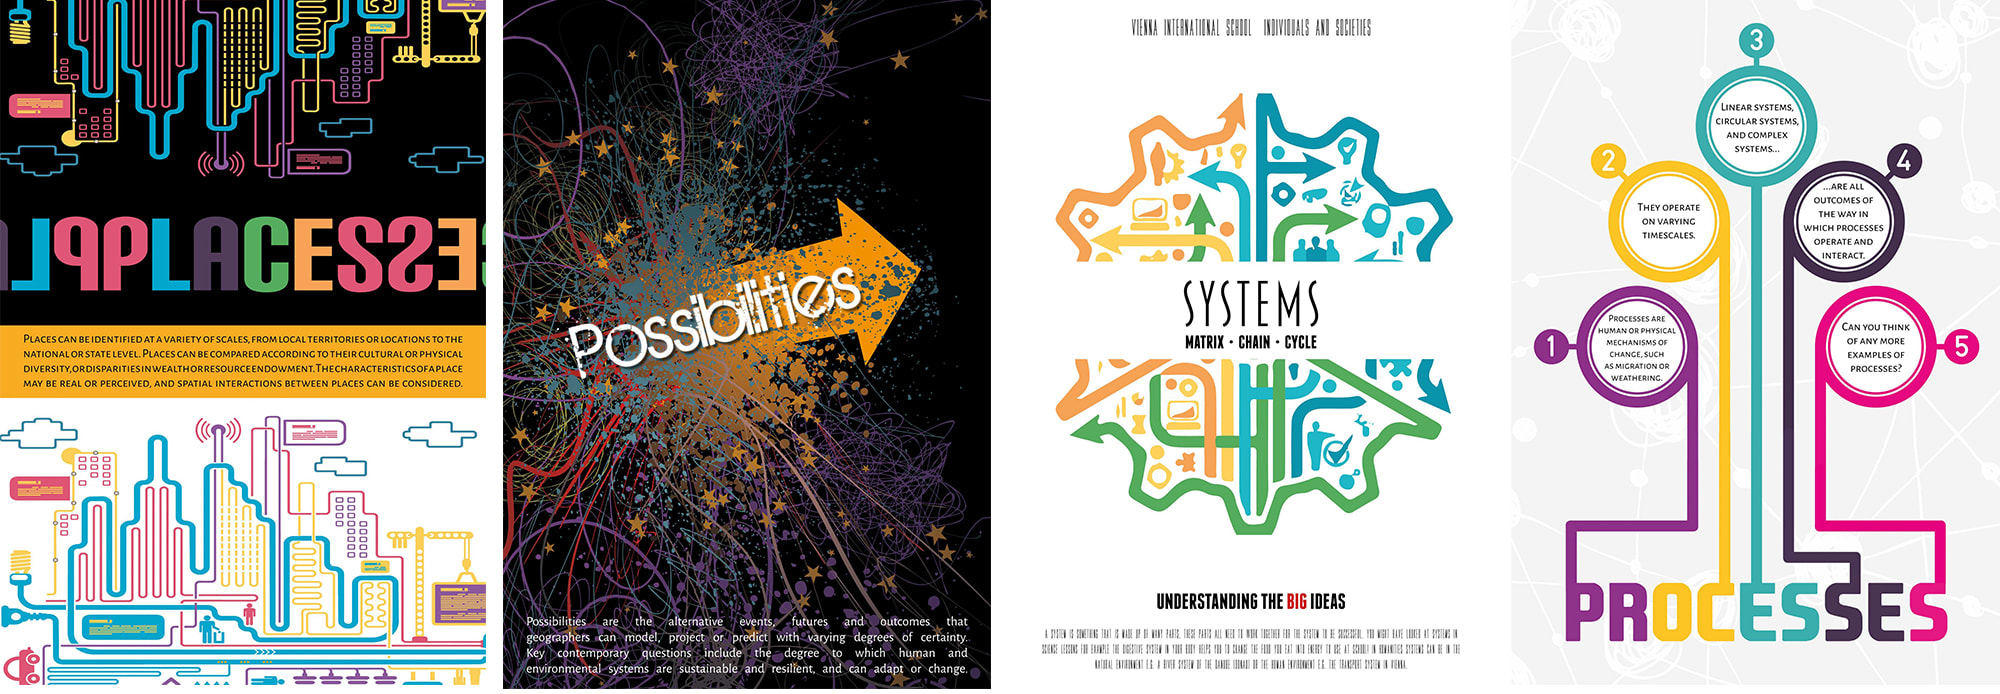 International Baccalaureate Social Studies Posters #2